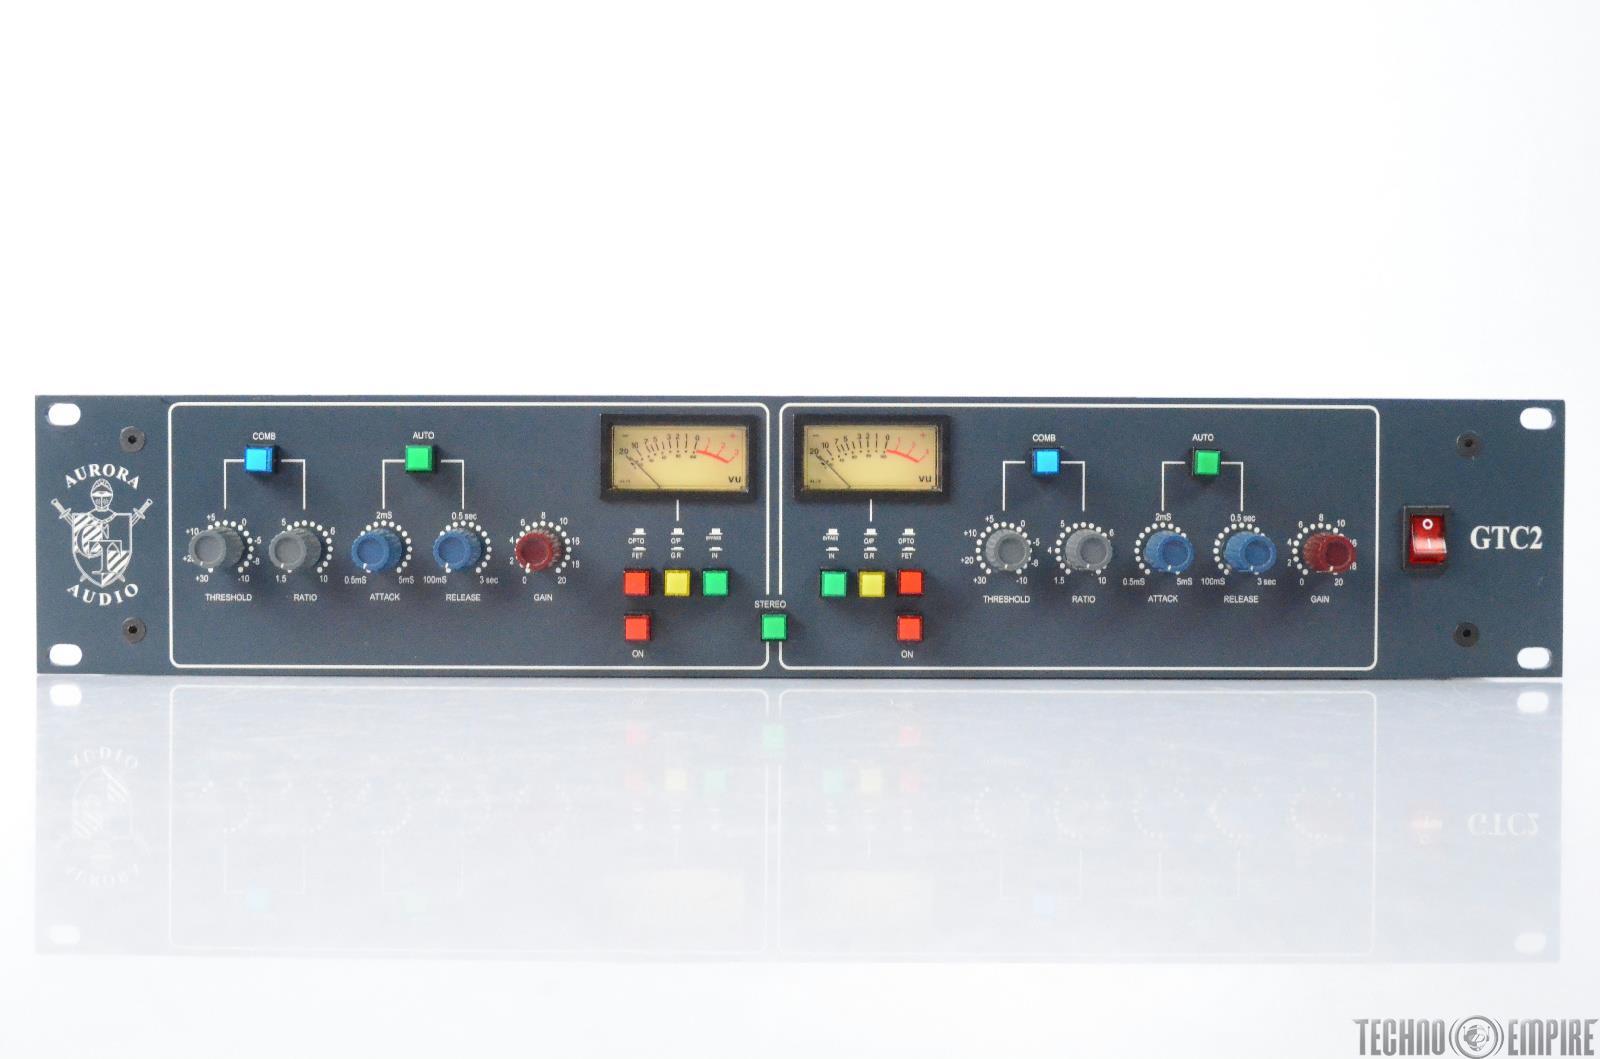 Aurora Audio GTC2 Dual Channel Compressor Serial #1 Grandmaster Recorders #28719